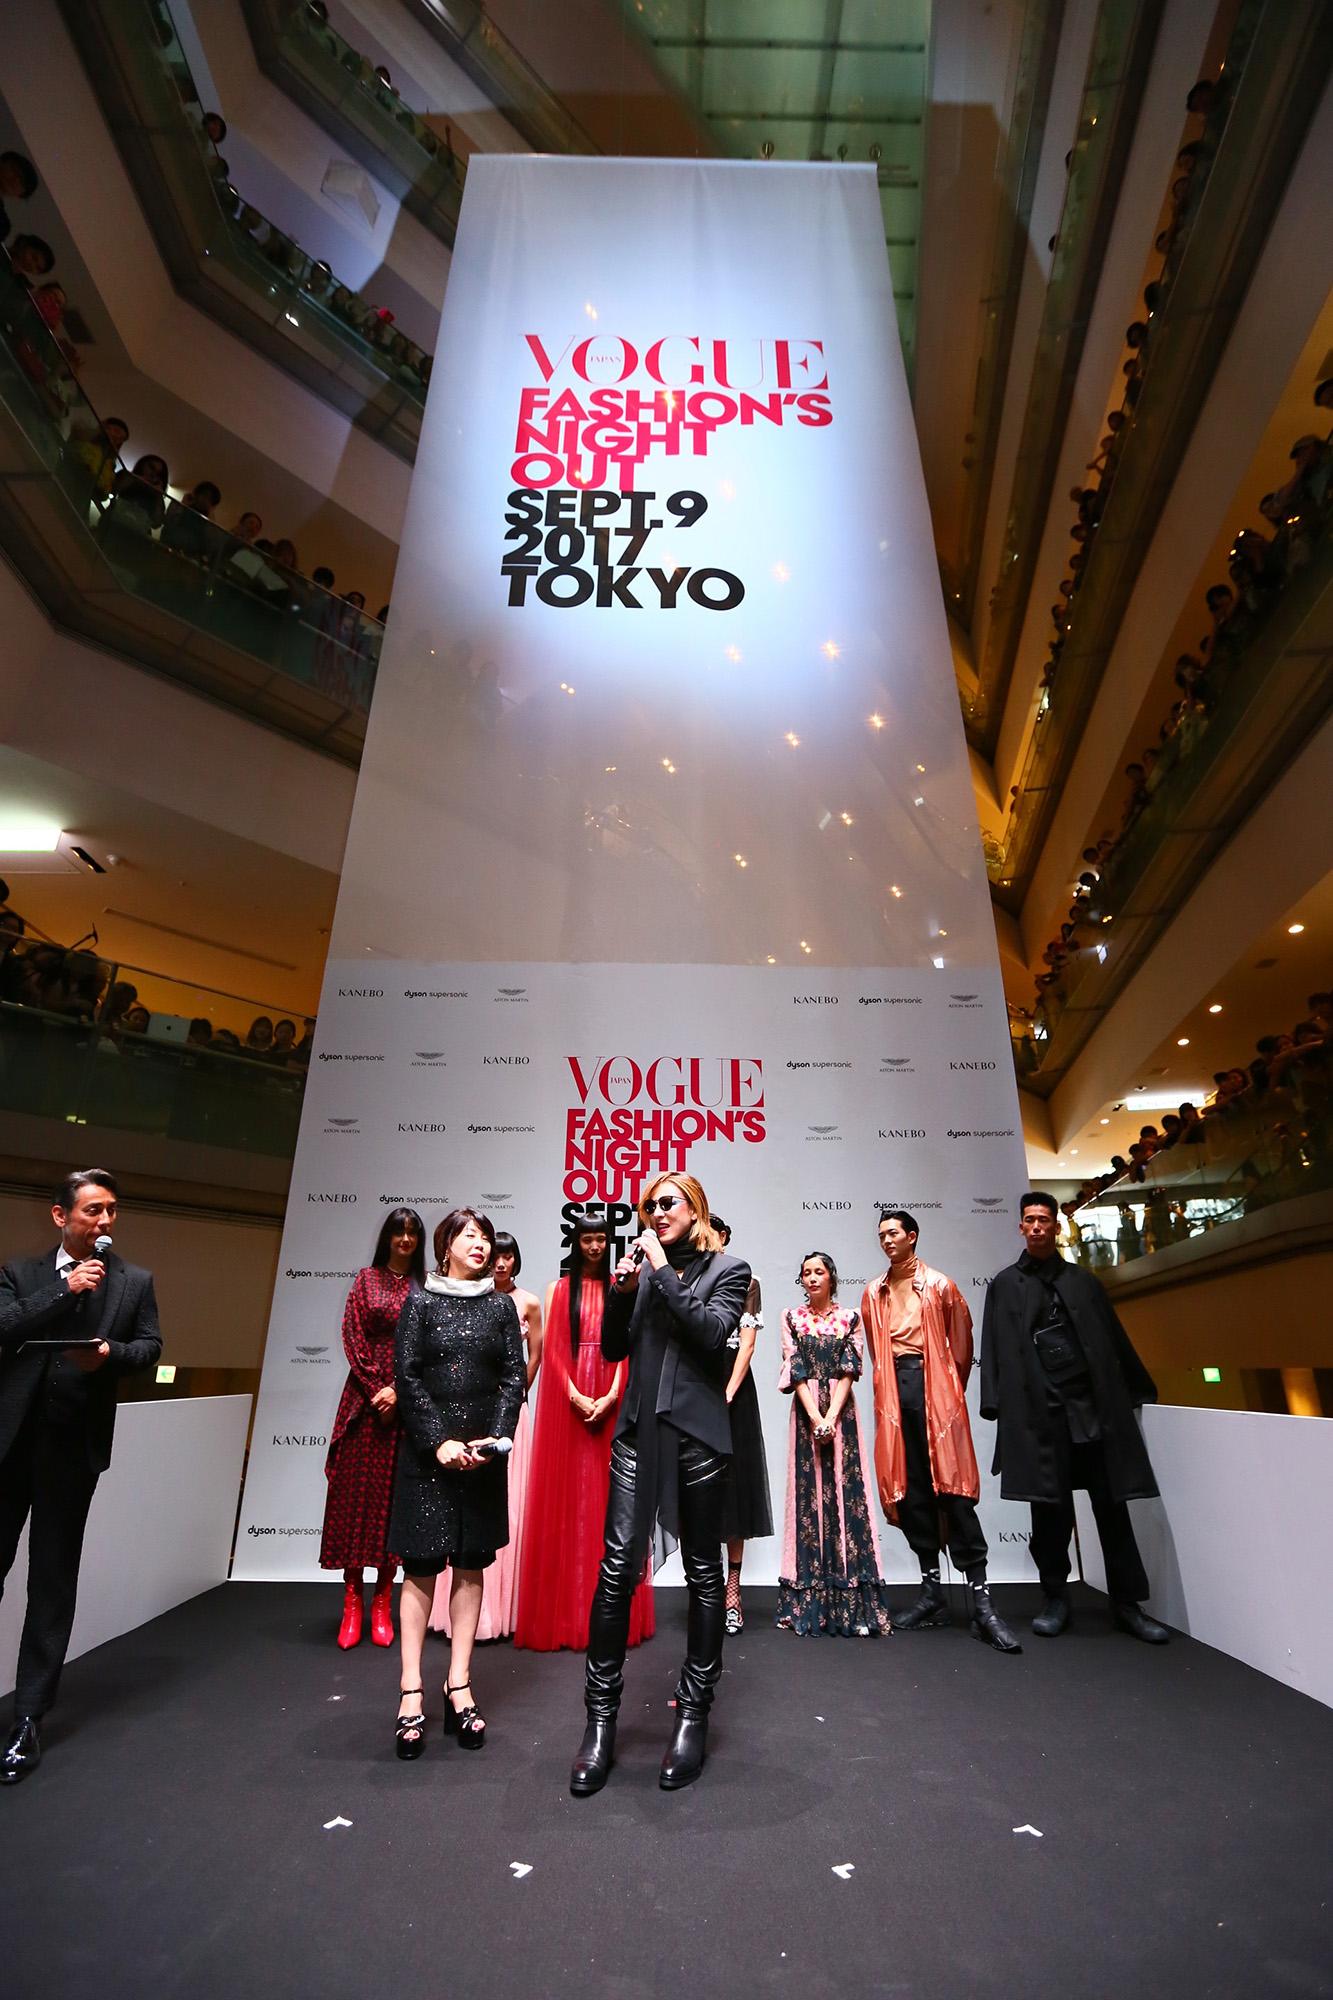 RMMS-Yoshiki-Vogue-Fashion-Night-Out-Japan-2017-0141